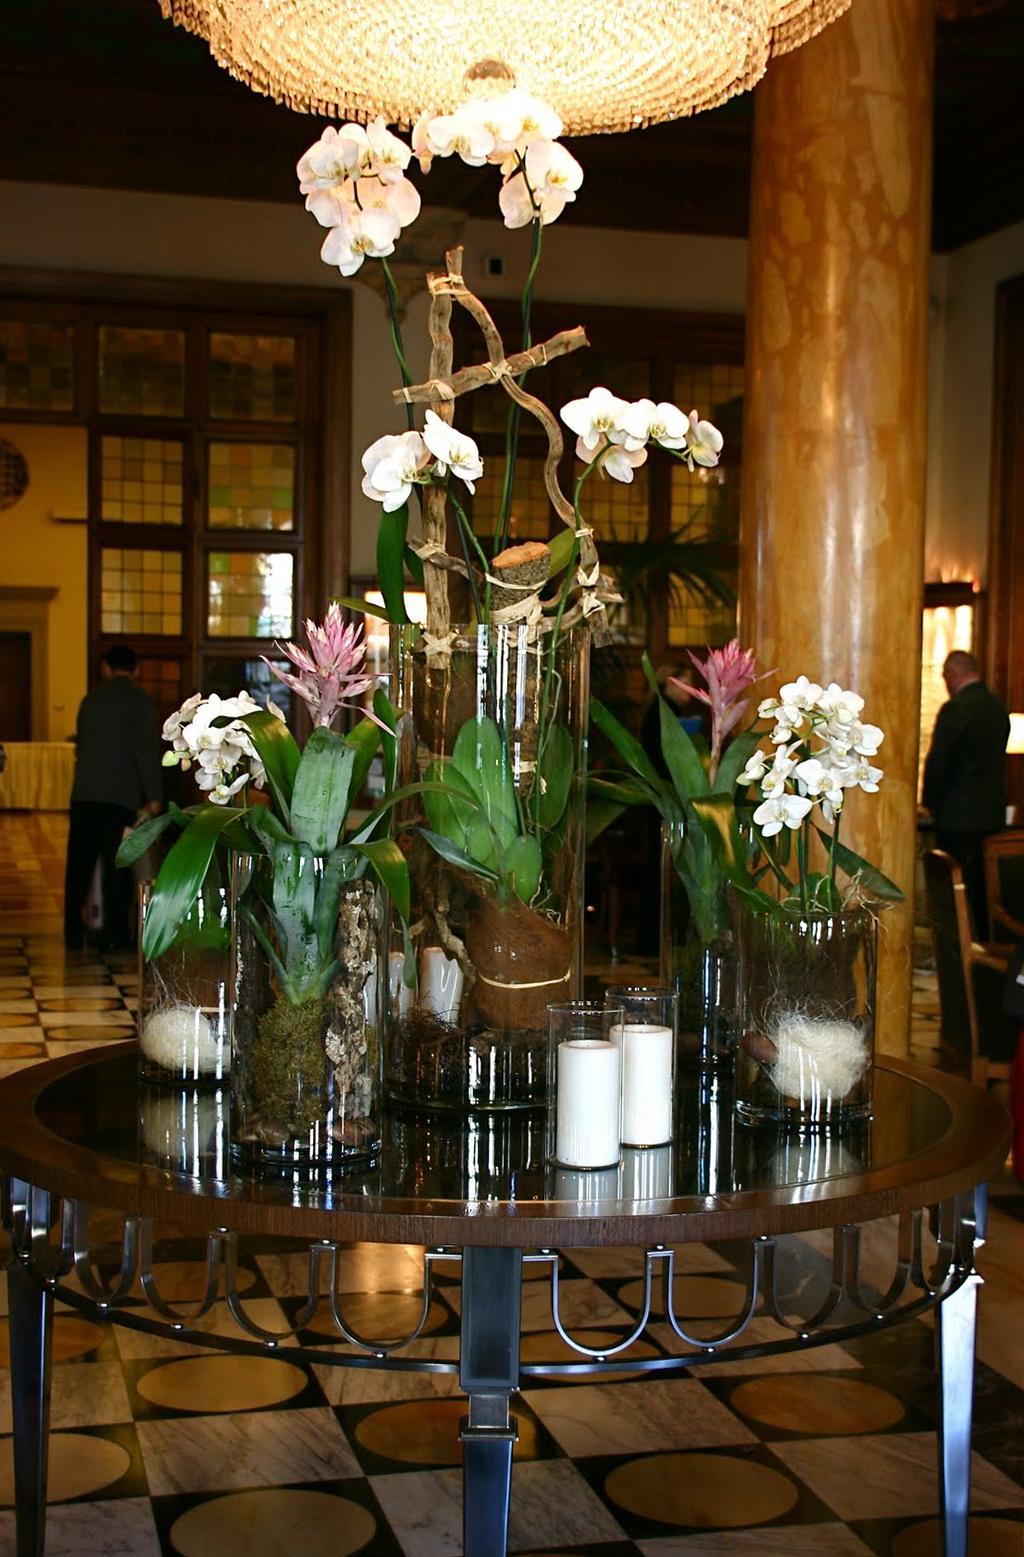 Tall cylinder vases hobby lobby home design ideas tall cylinder vases hobby lobby reviewsmspy